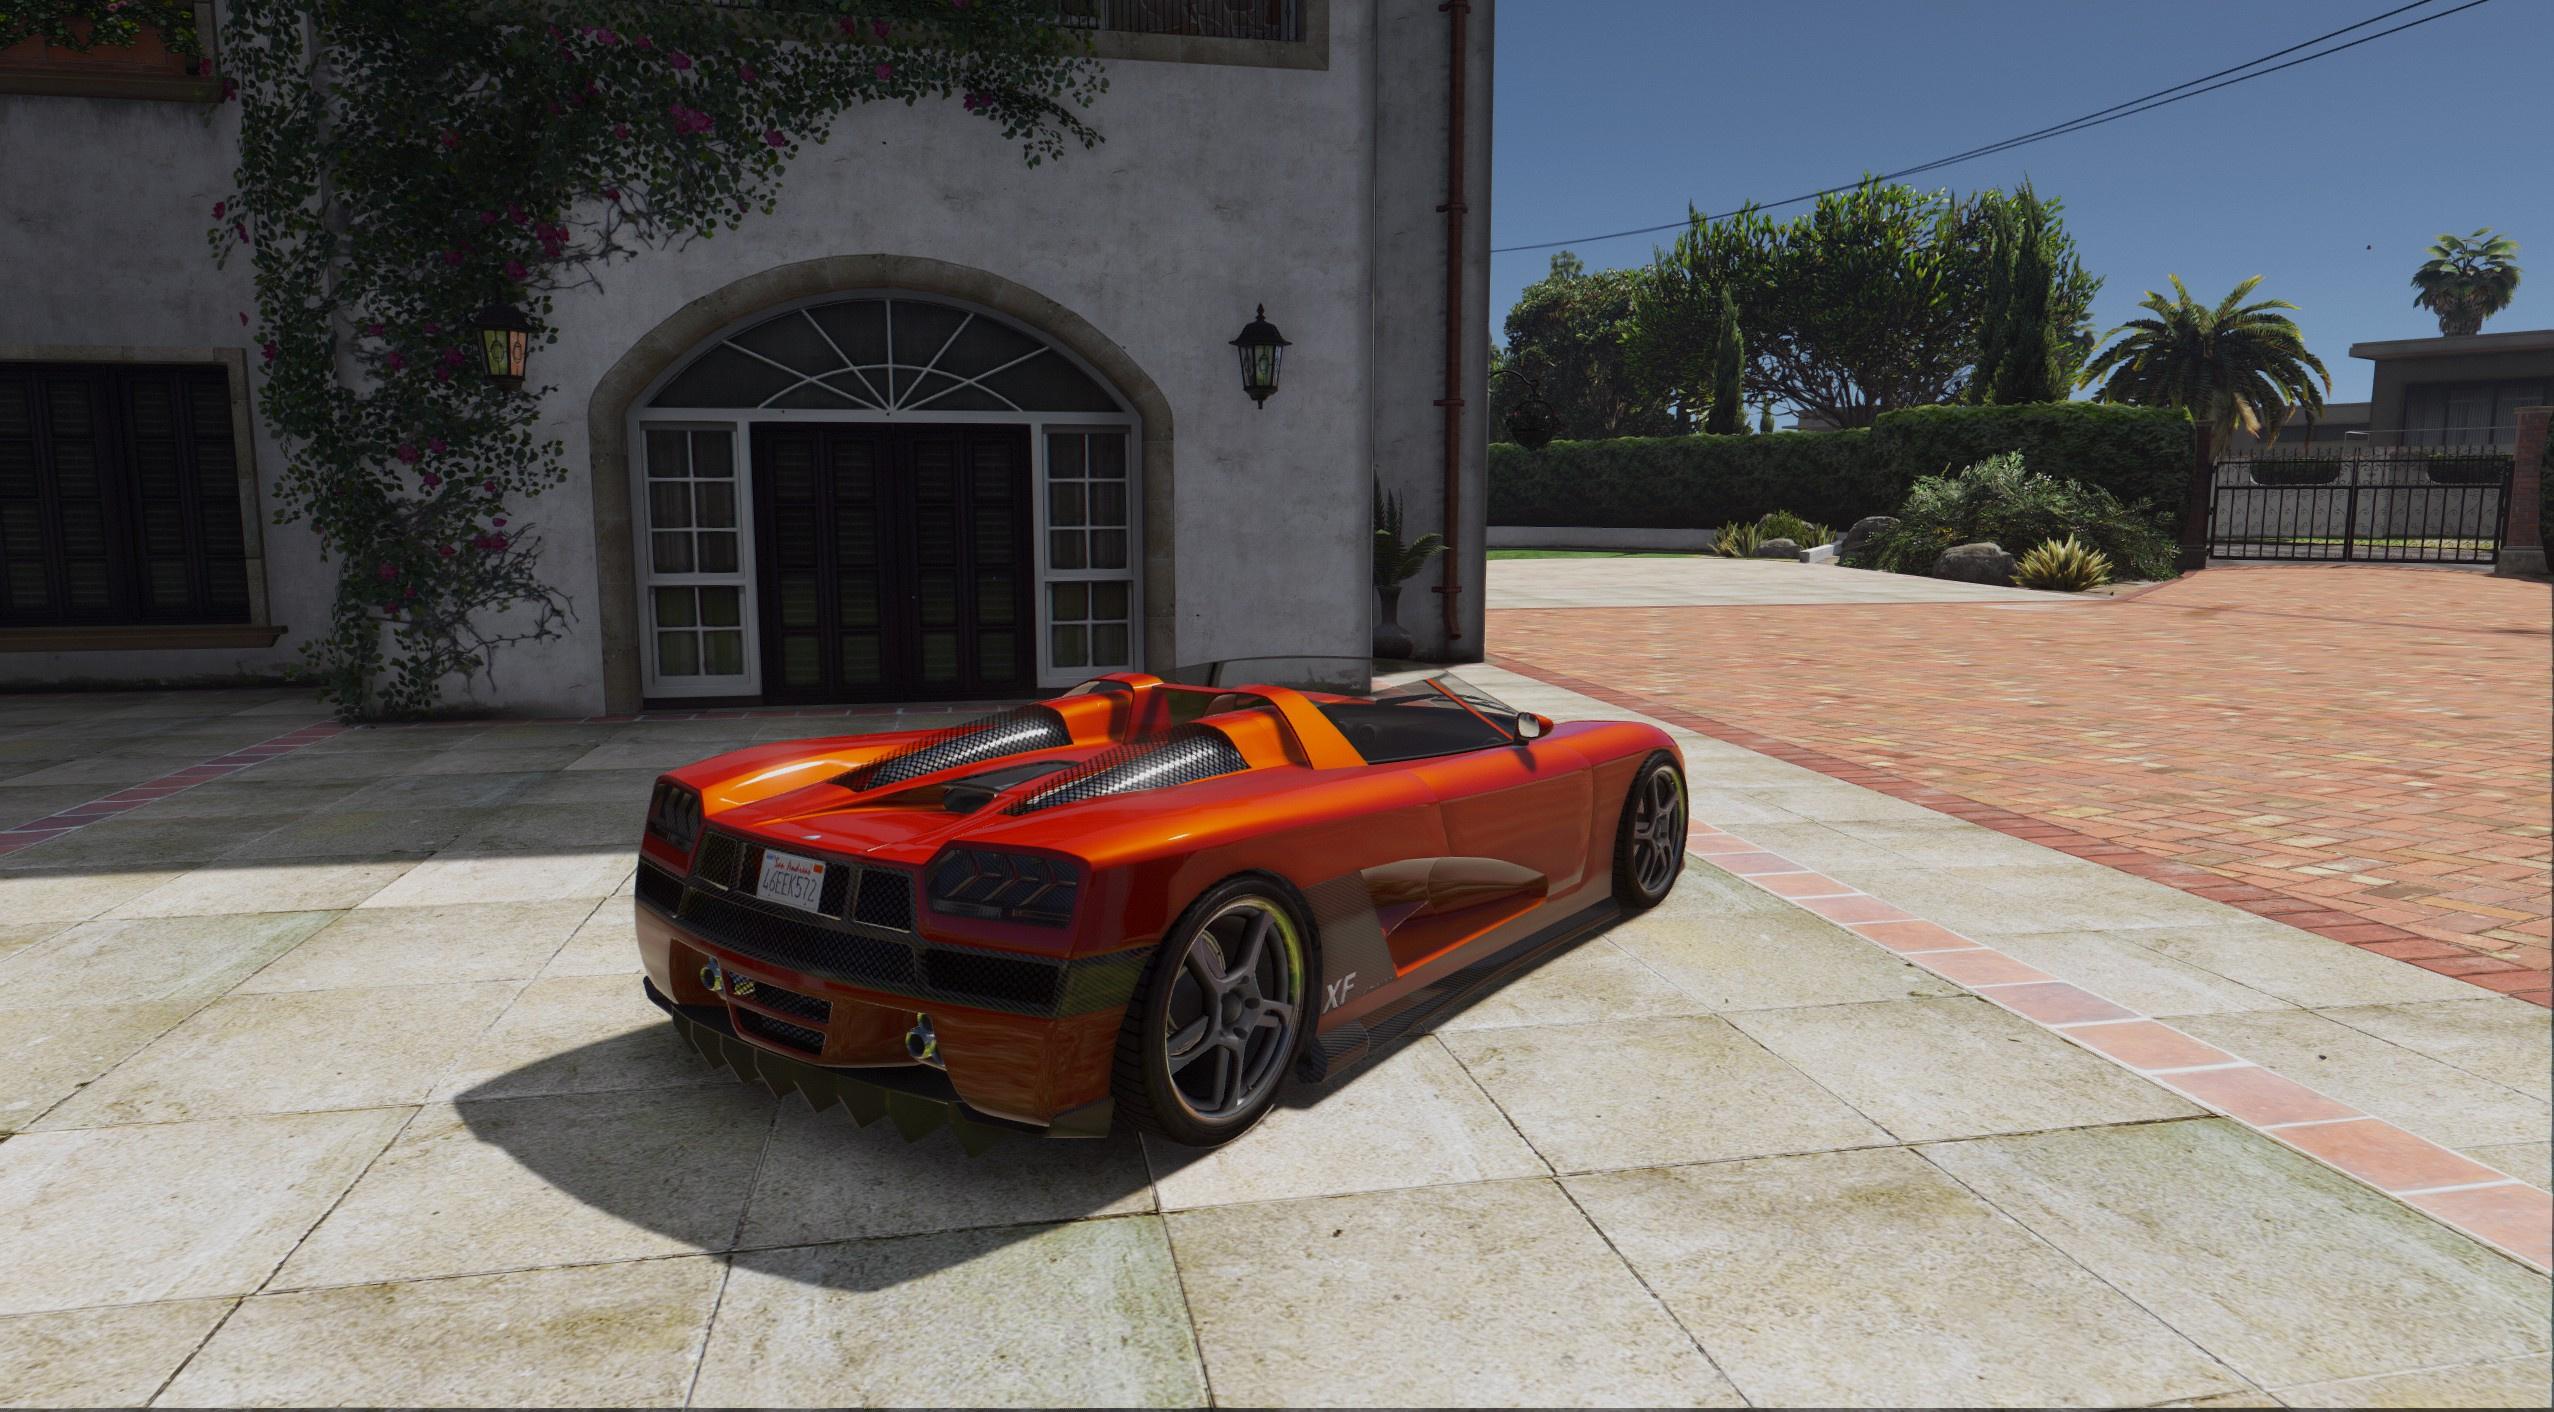 Entity Xf Roadster Gta5 Mods Com